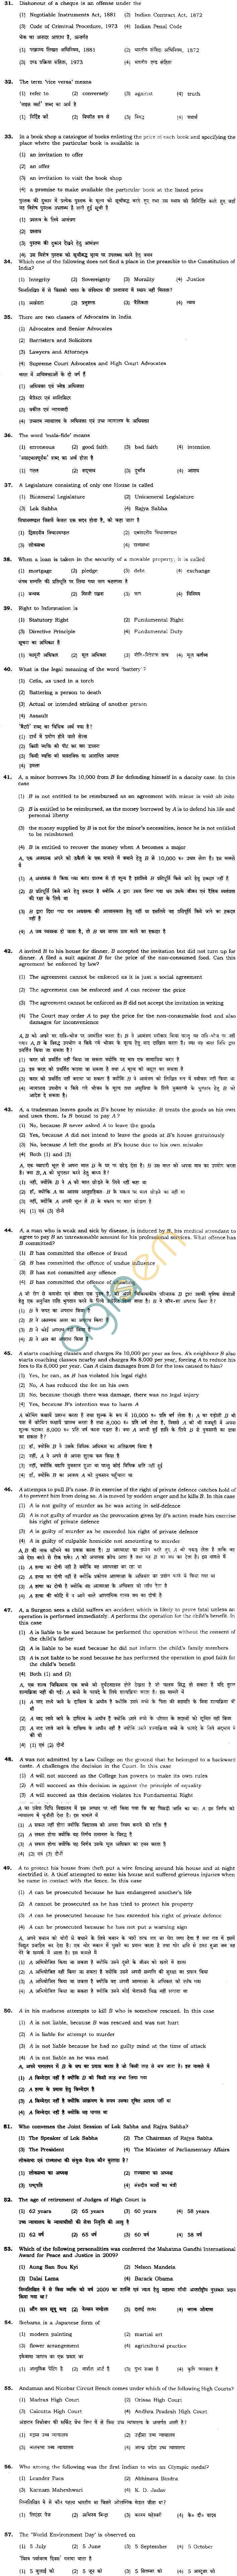 BHU UET 2011 LLB Question Paper